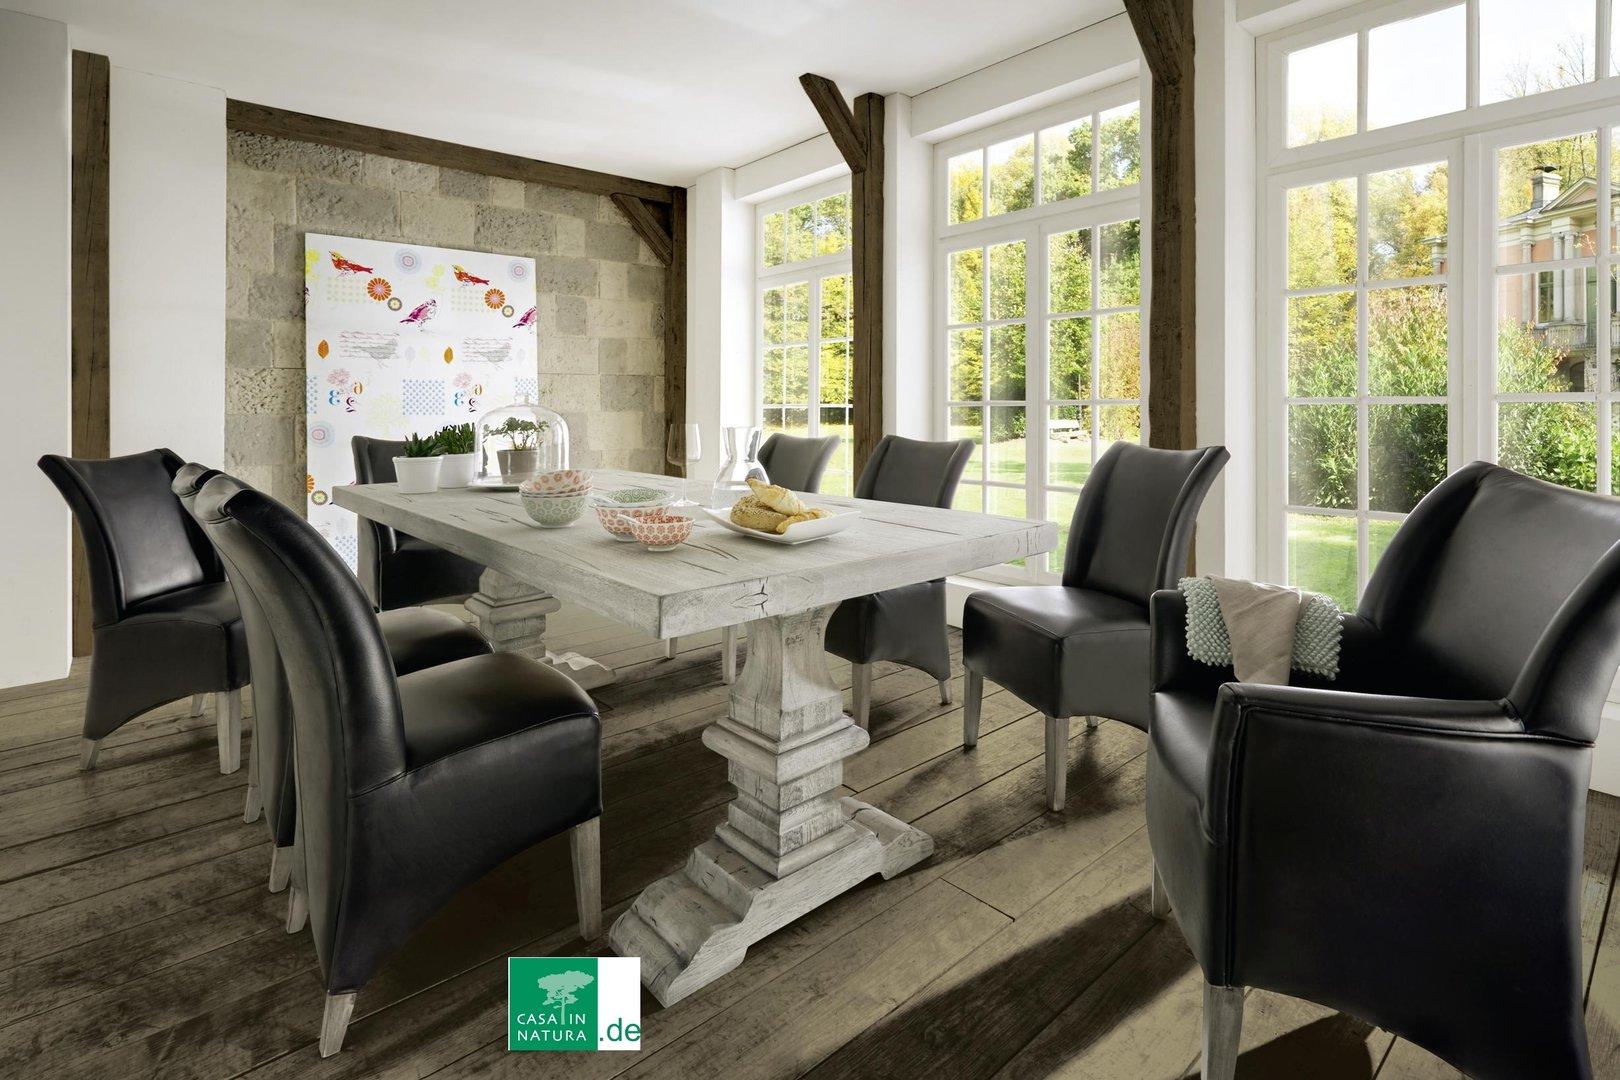 Esstisch im Shabby Chic-Design, Farbe Eisgrau - casainnatura.de